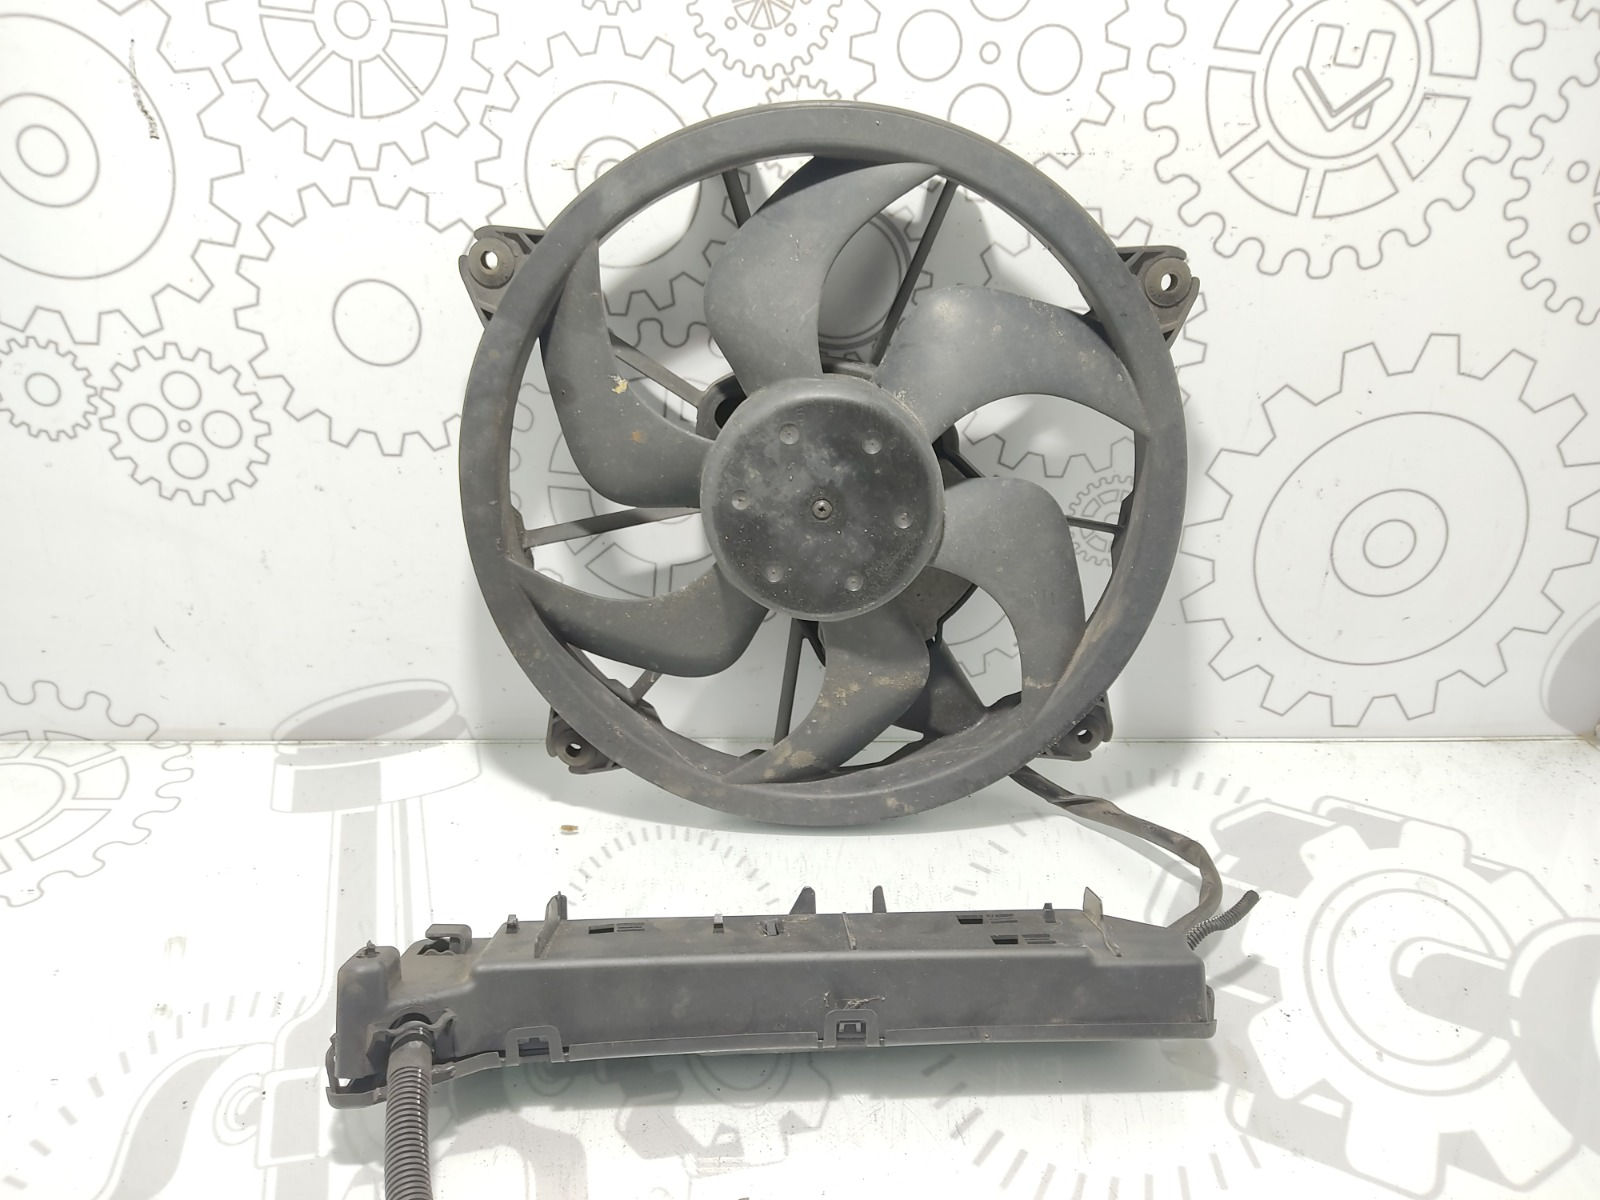 Вентилятор радиатора Peugeot 407 2.0 HDI 2010 (б/у)